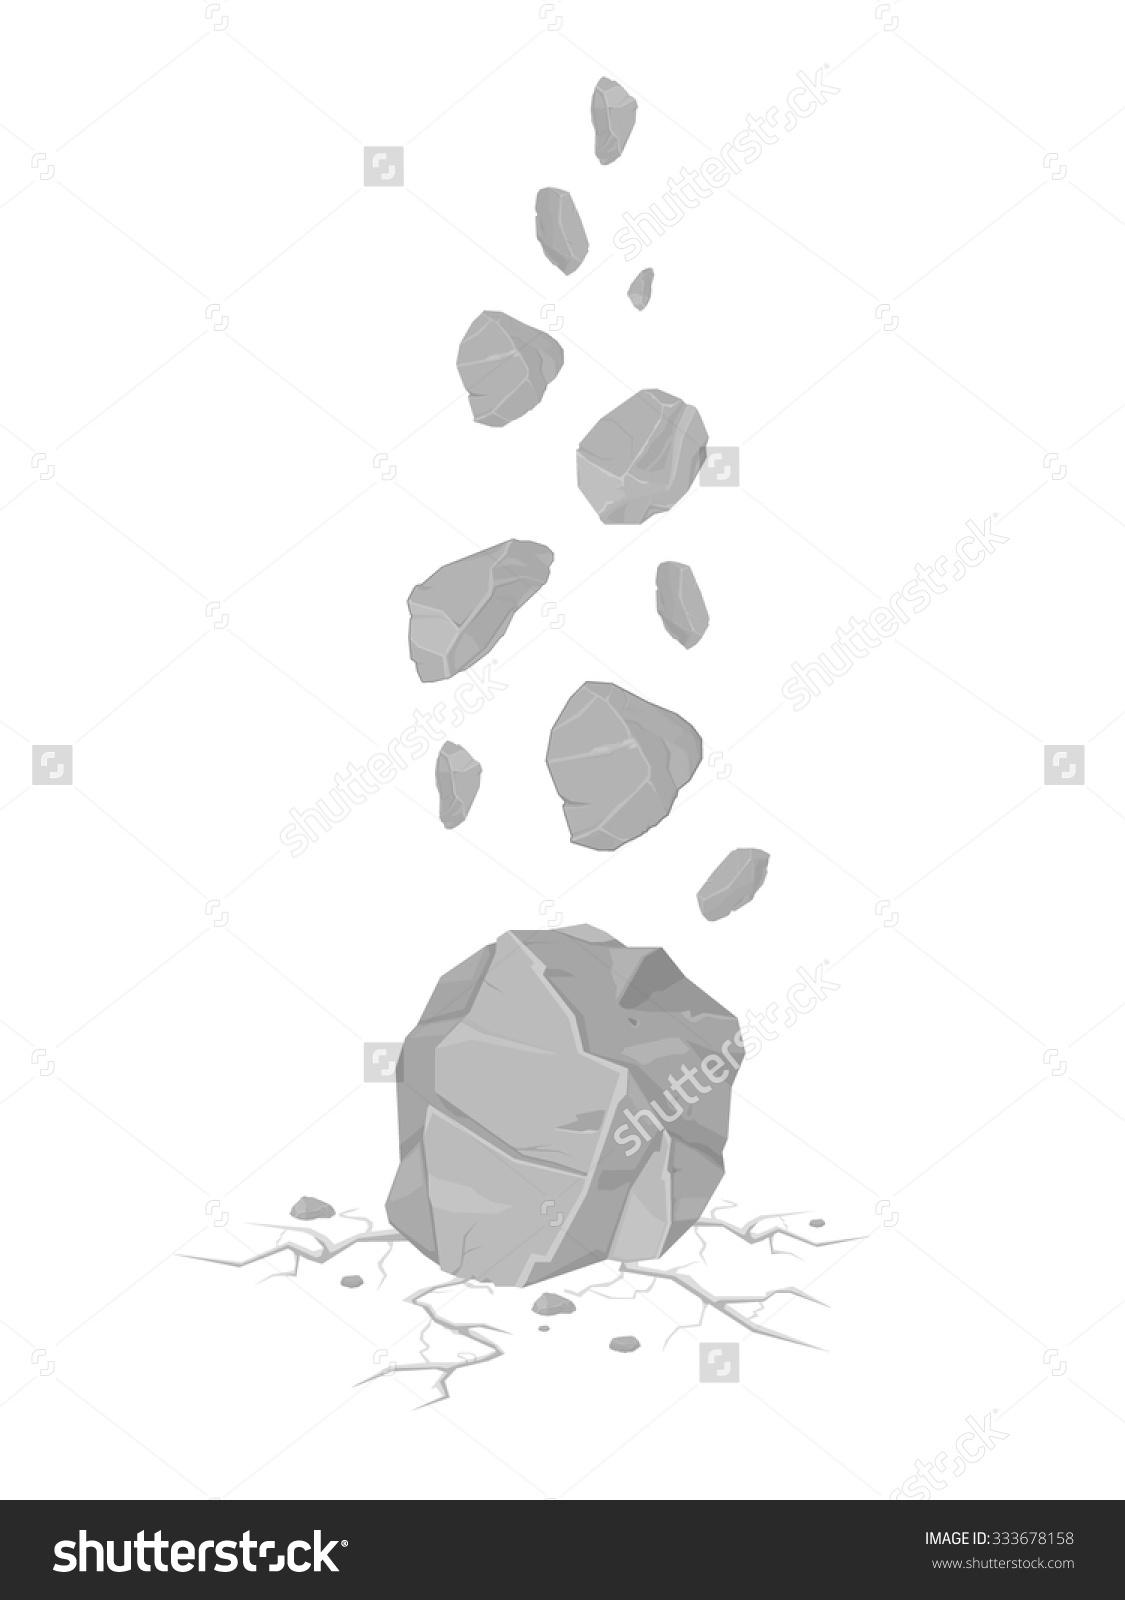 Falling rock clipart gif.